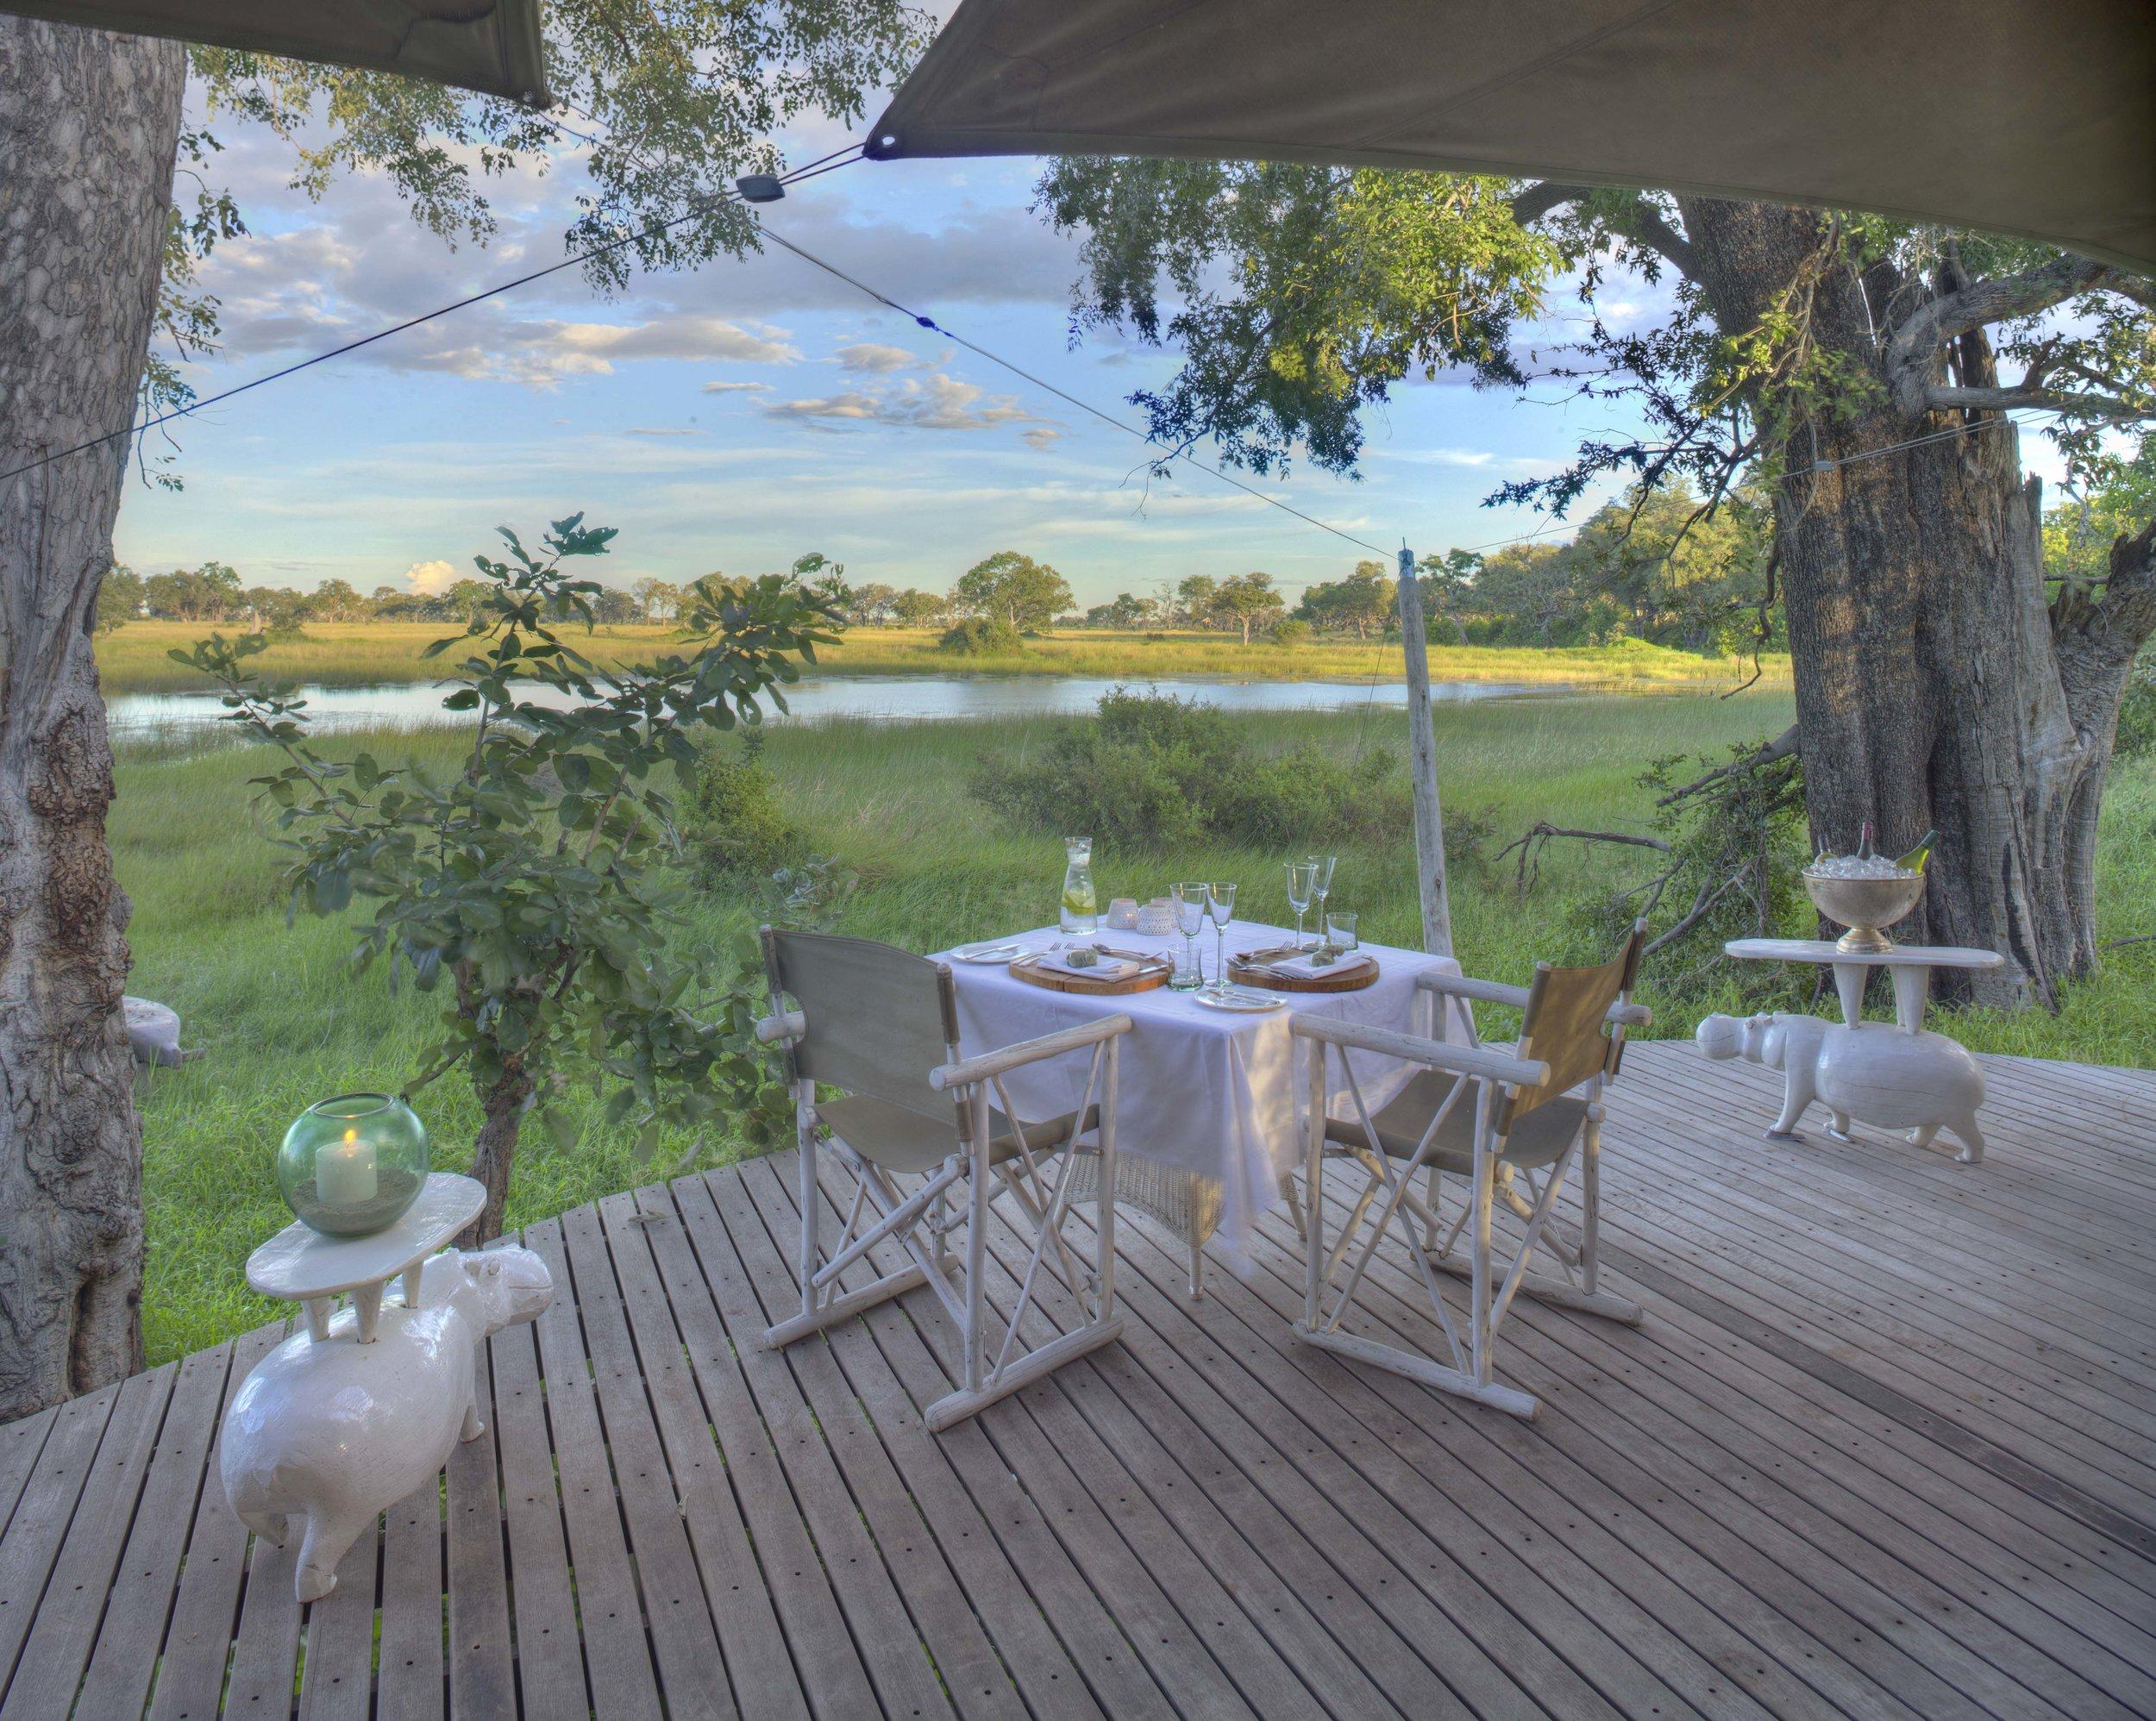 andBeyond-Xaranna-Okavango-Delta-Camp-Guest-Area12.jpg